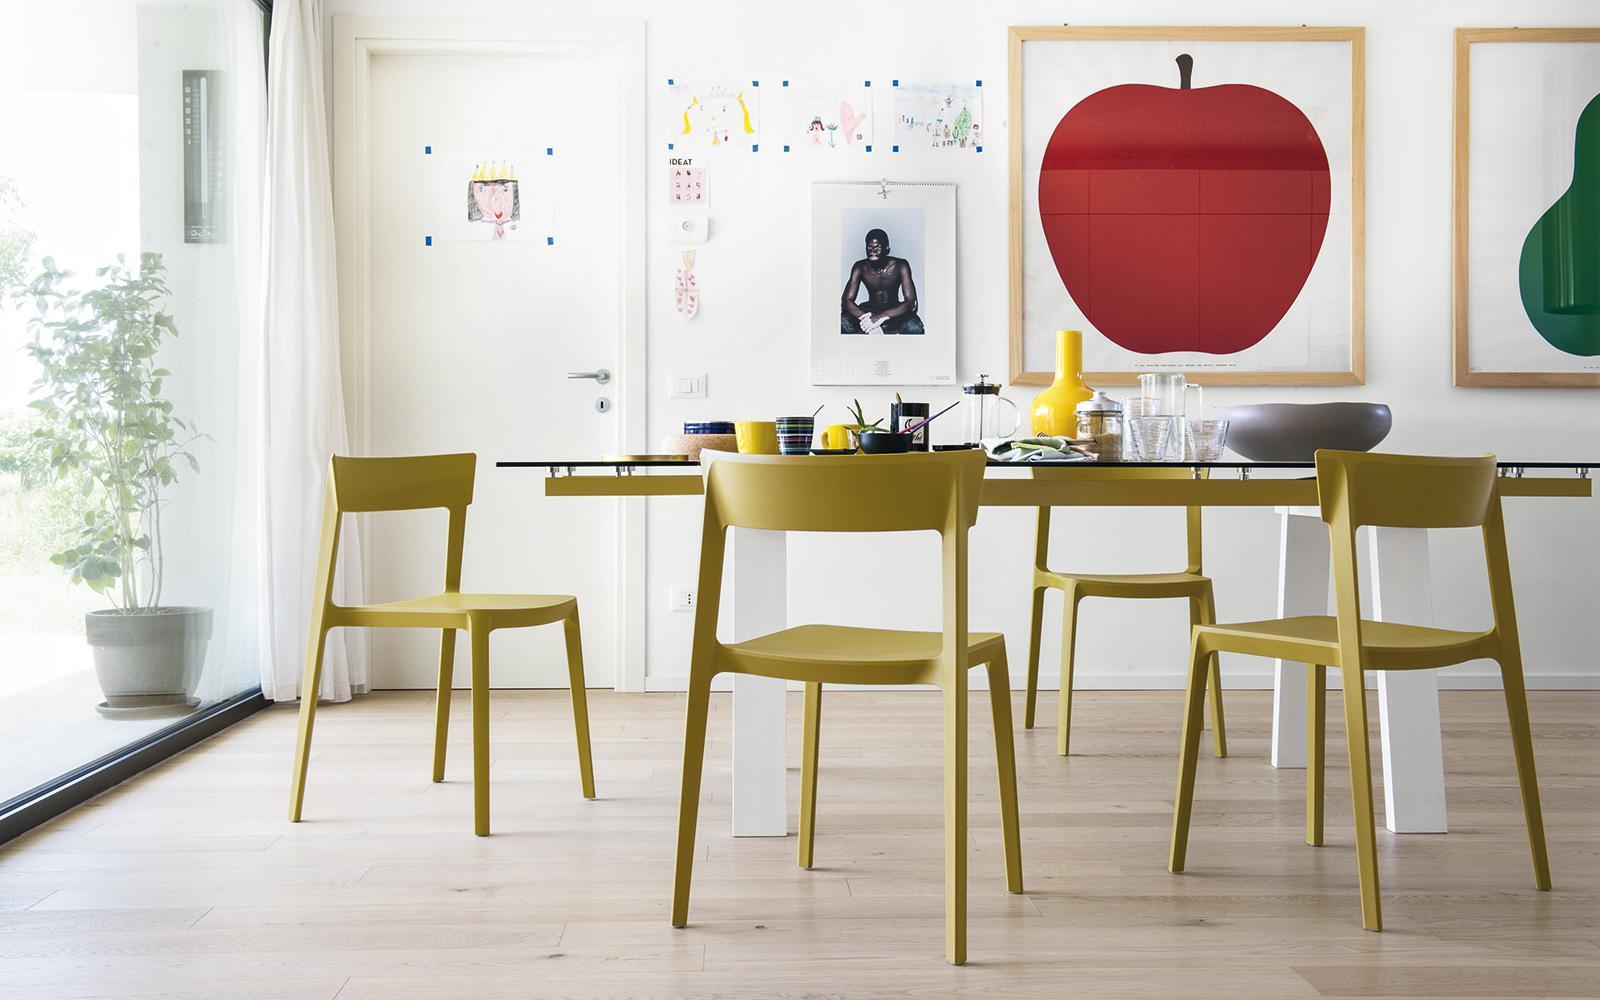 Calligaris sedie e tavoli 6 for Tavoli e sedie calligaris prezzi